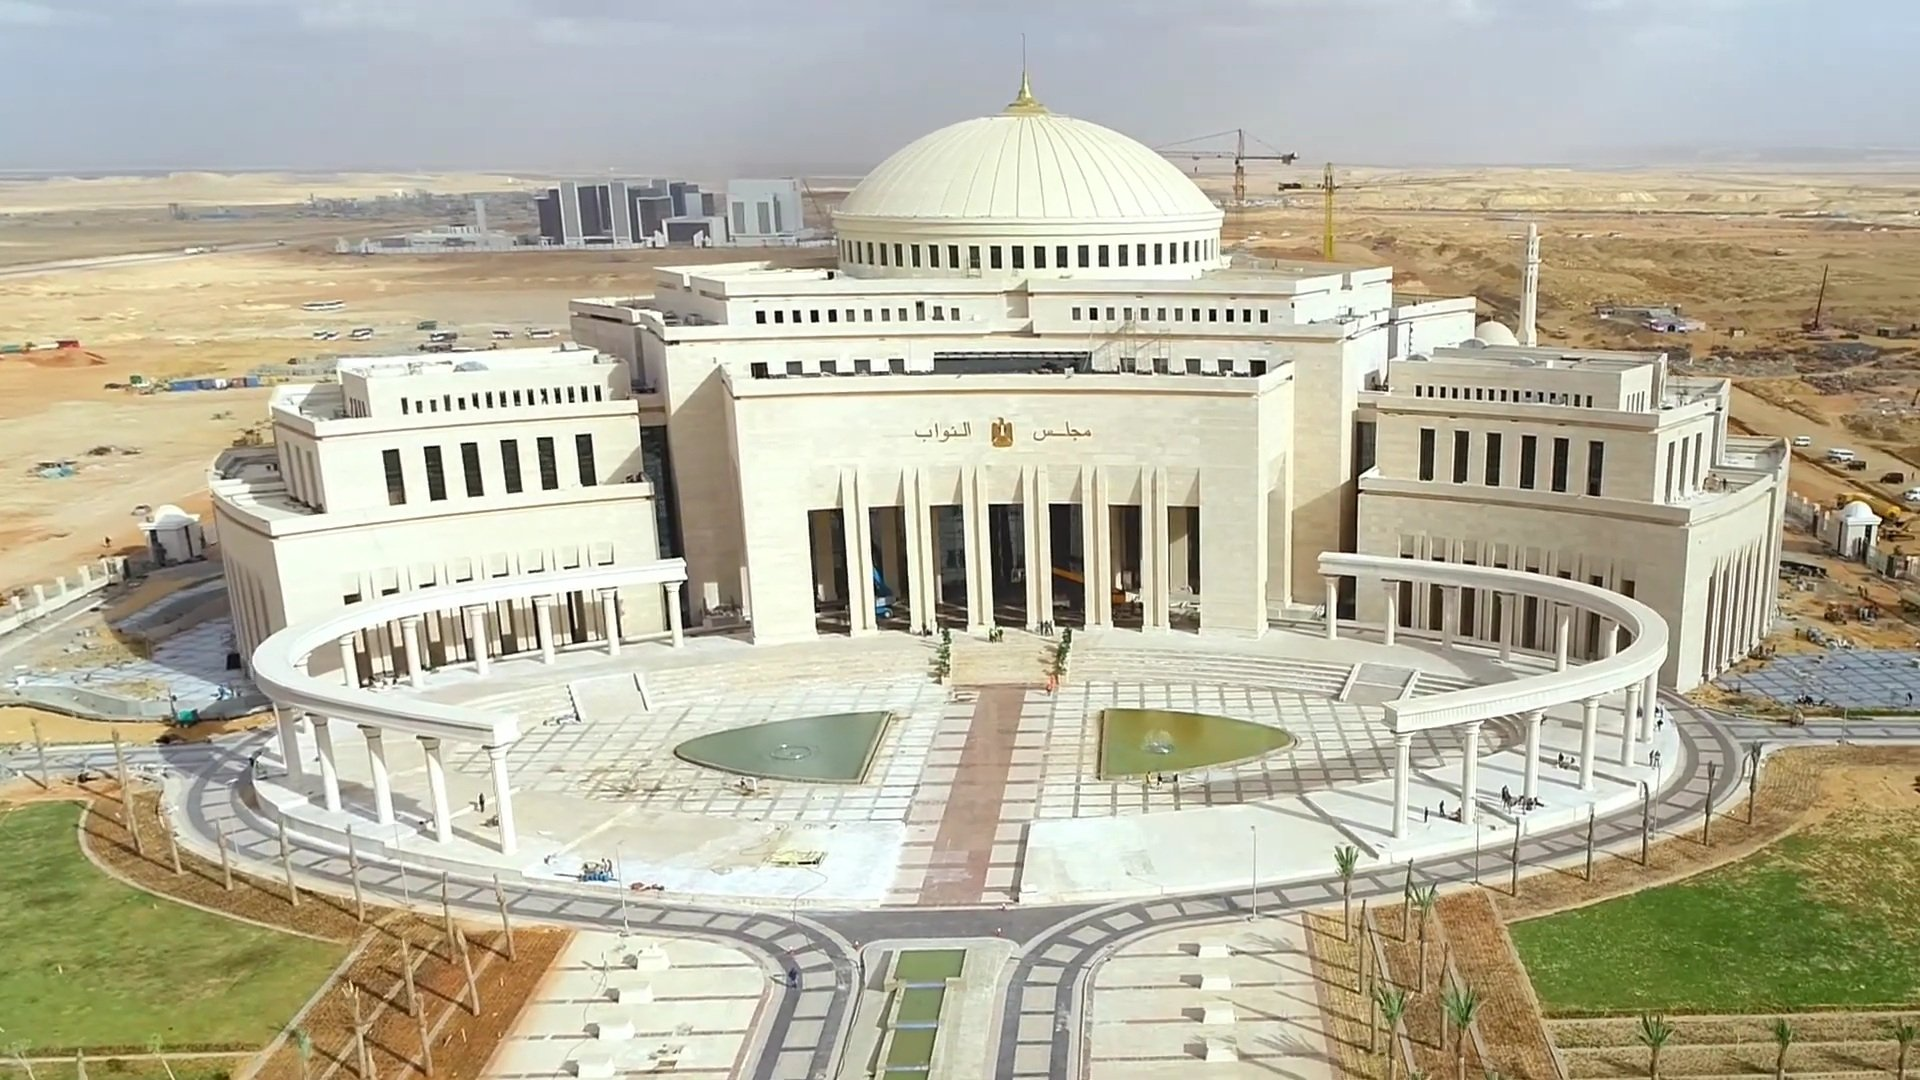 2021-08-29 Egypt Parliament New Administrative Capital 2021 04